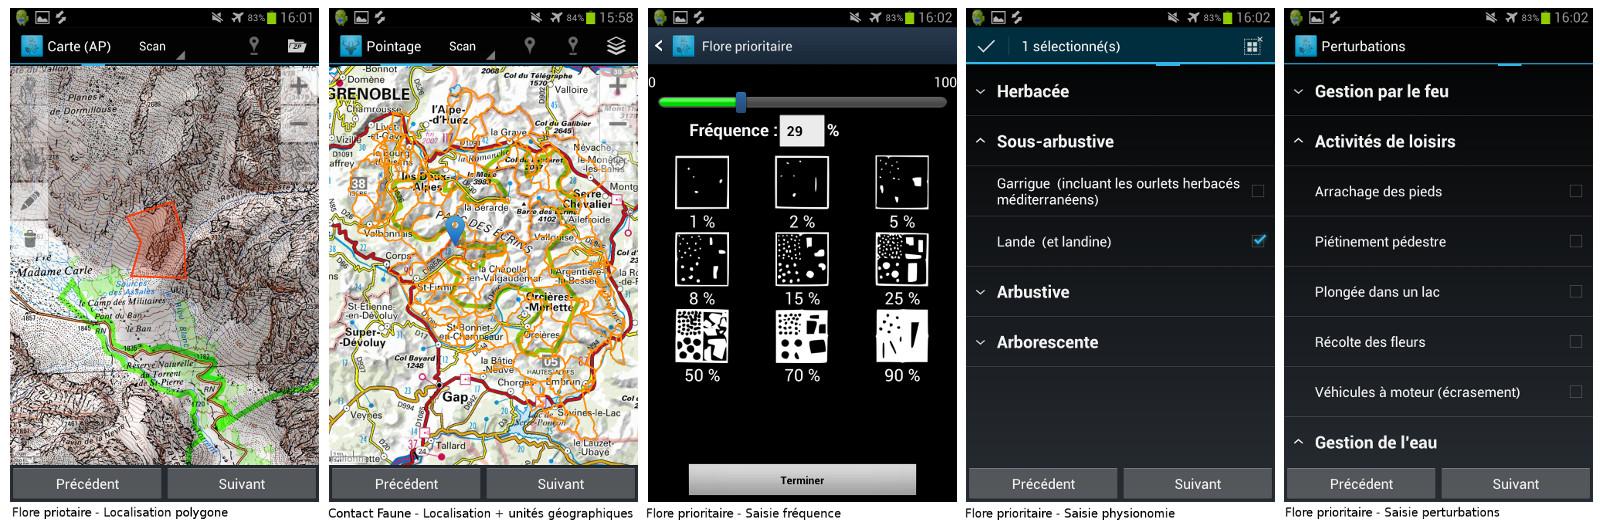 GeoNature-mobile screenshot 2